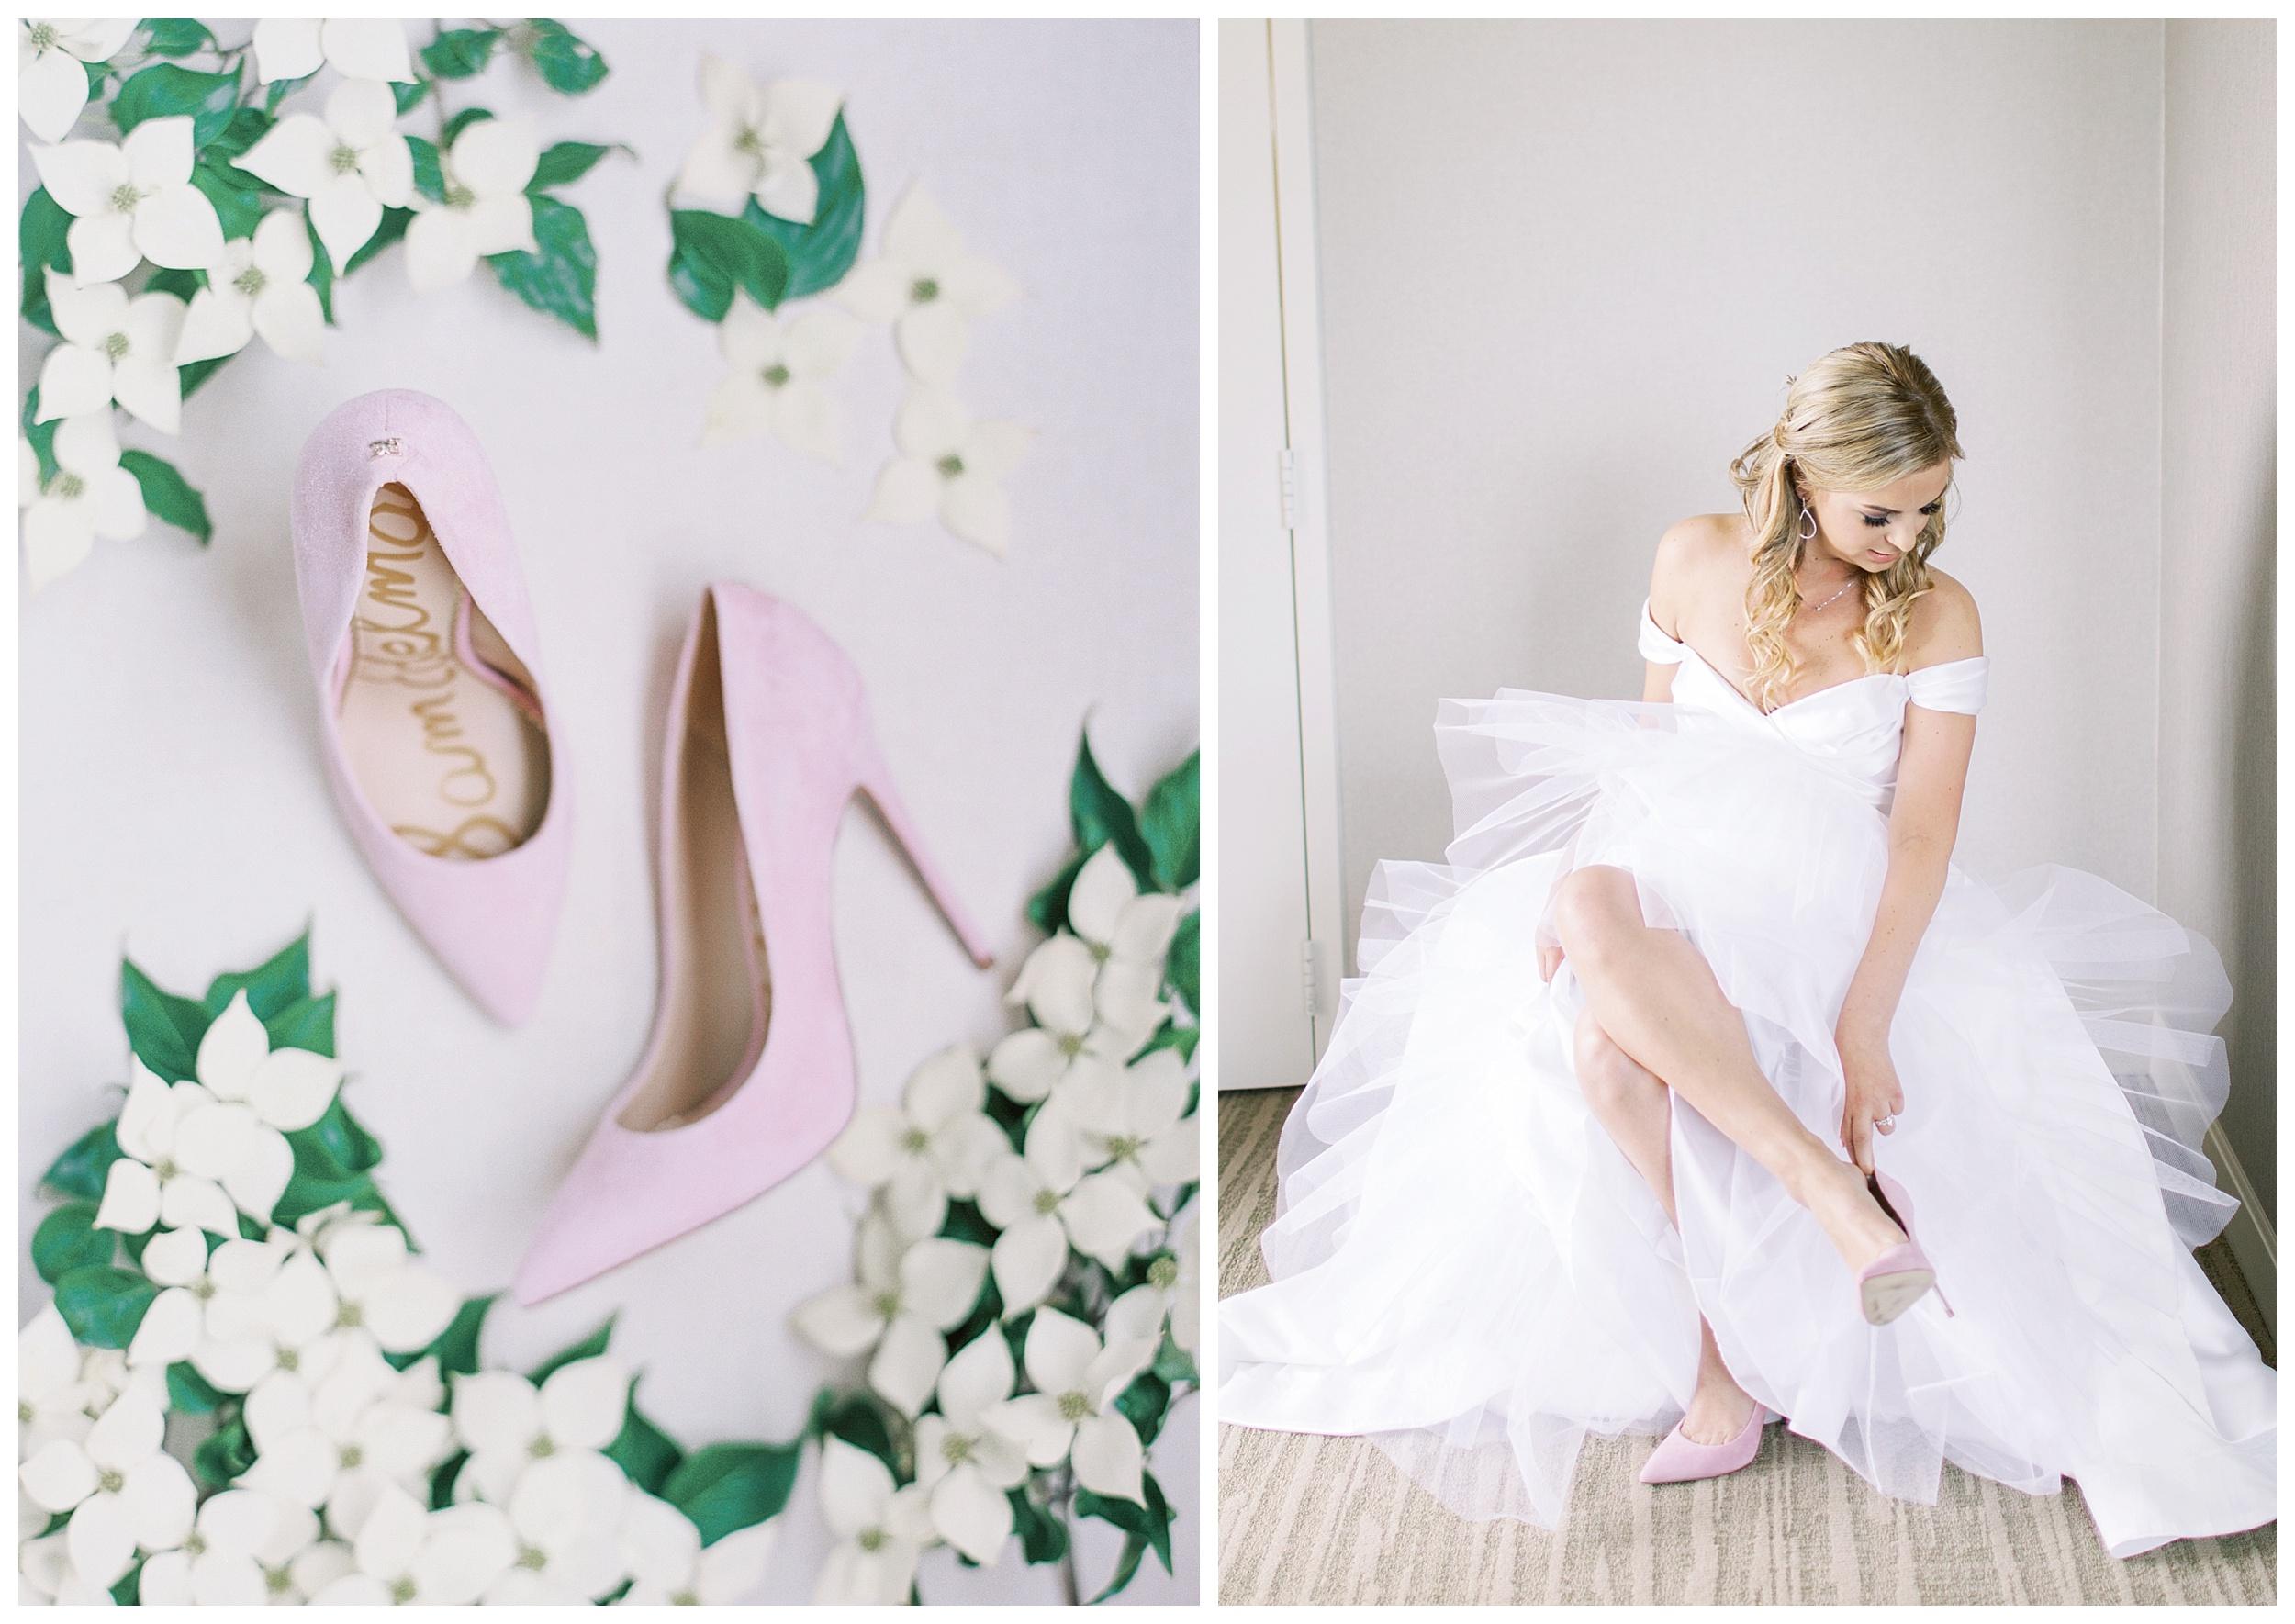 Lansdowne Resort Wedding | Virginia Film Wedding Photographer Kir Tuben_0016.jpg